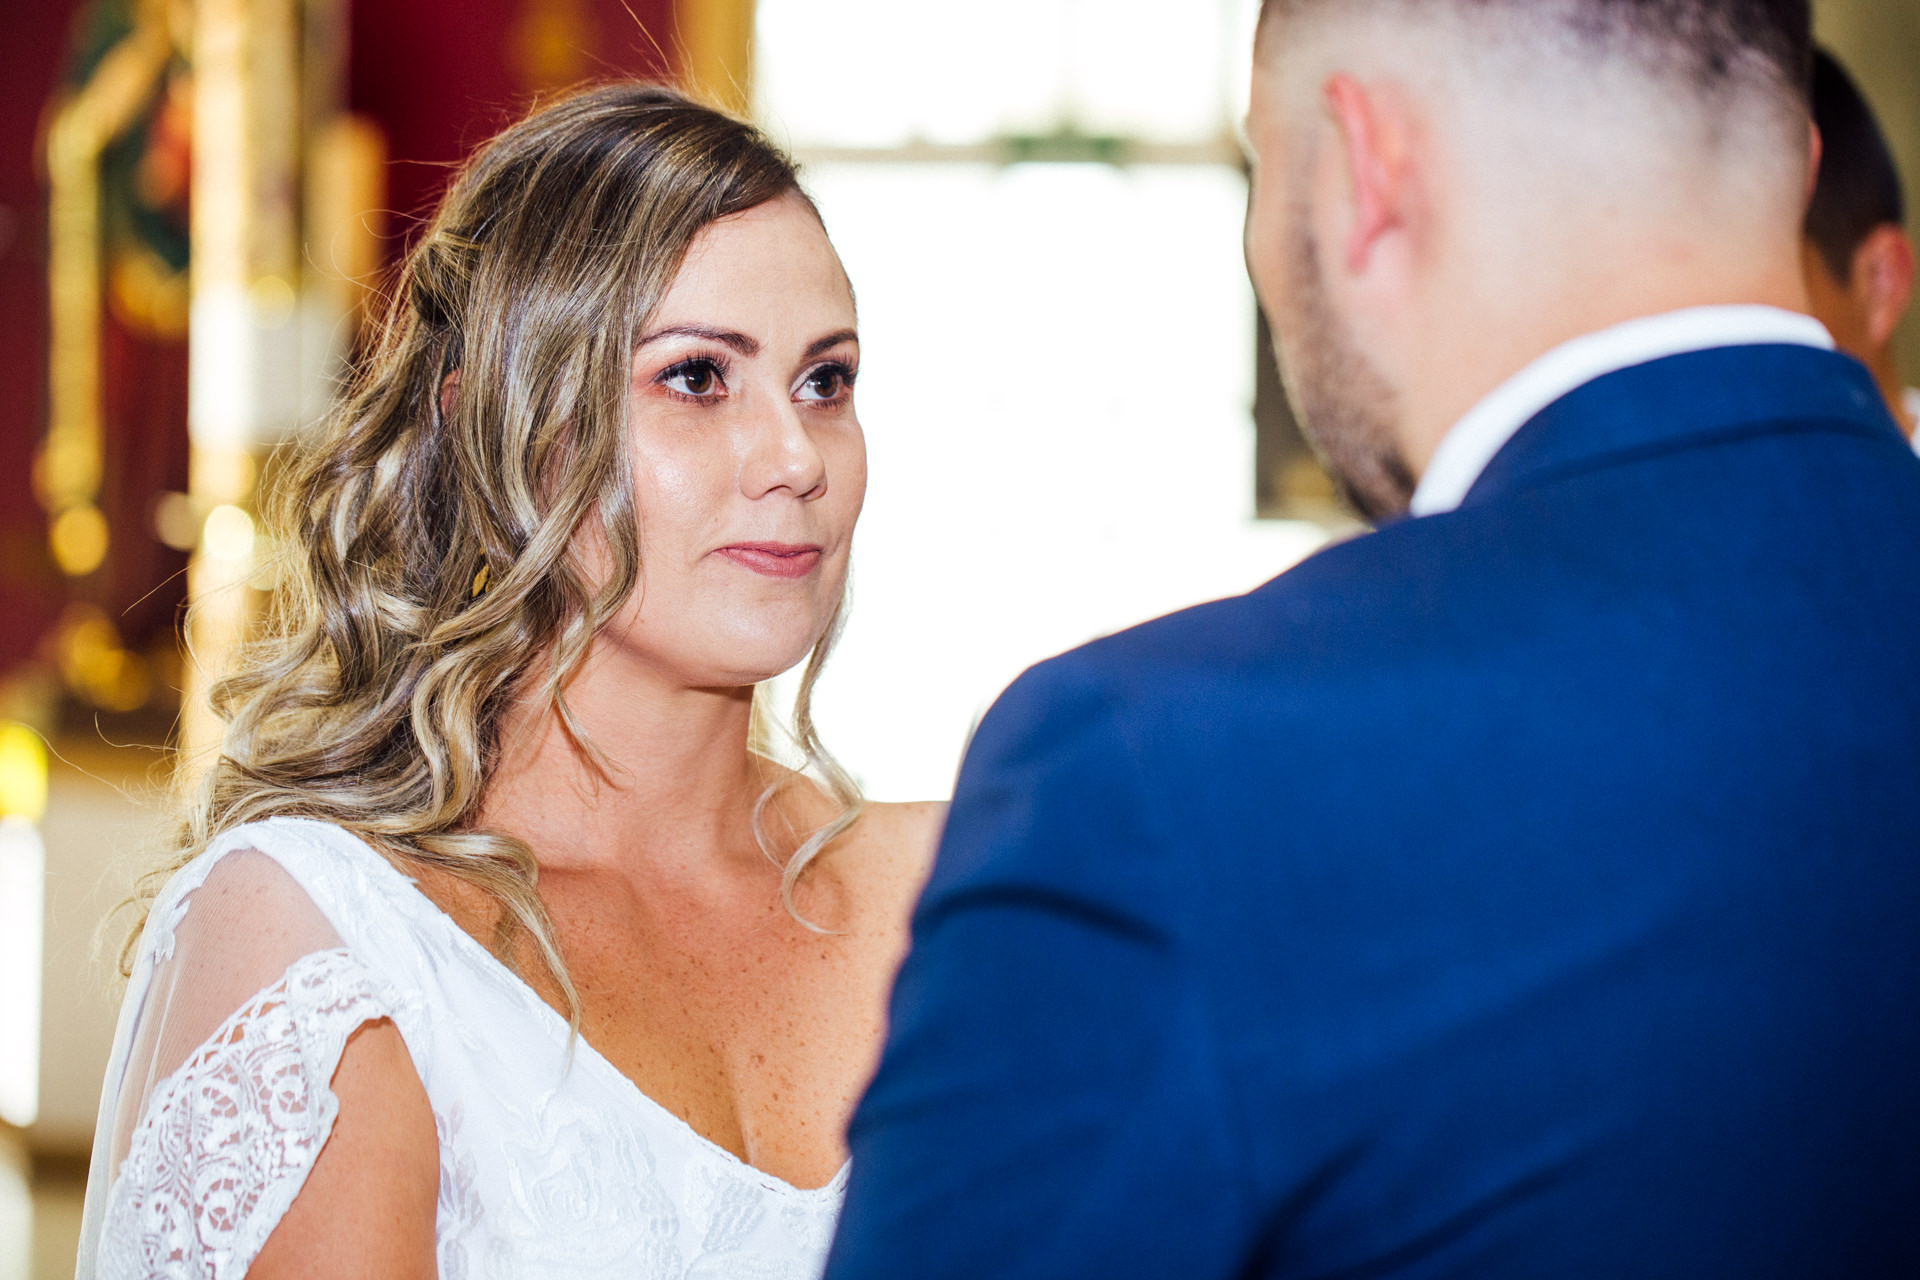 Wedding-Boda-Matrimonio-Fotografo-Fotografia-bodas-Medellin-Llanogrande-Colombia-Bogota-Cartagena-Miami-Wed-Destination-Photojournalism (108).JPG